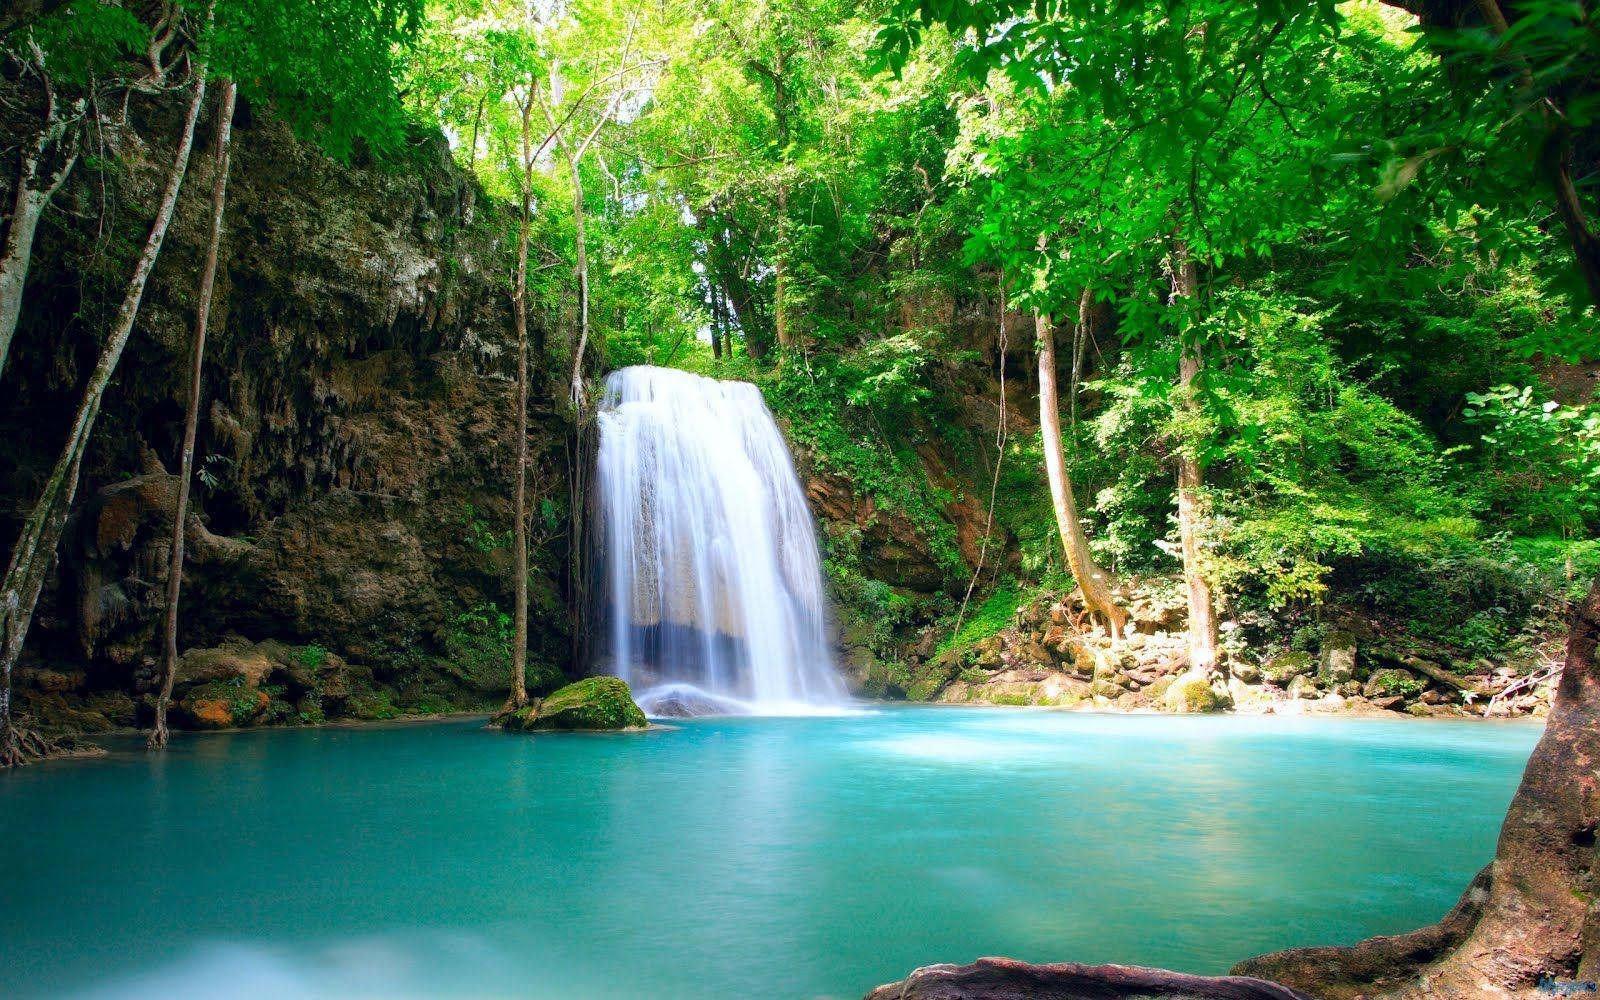 Tropical Rainforest Waterfalls Hd Wallpapers 1600 1000 Pixel